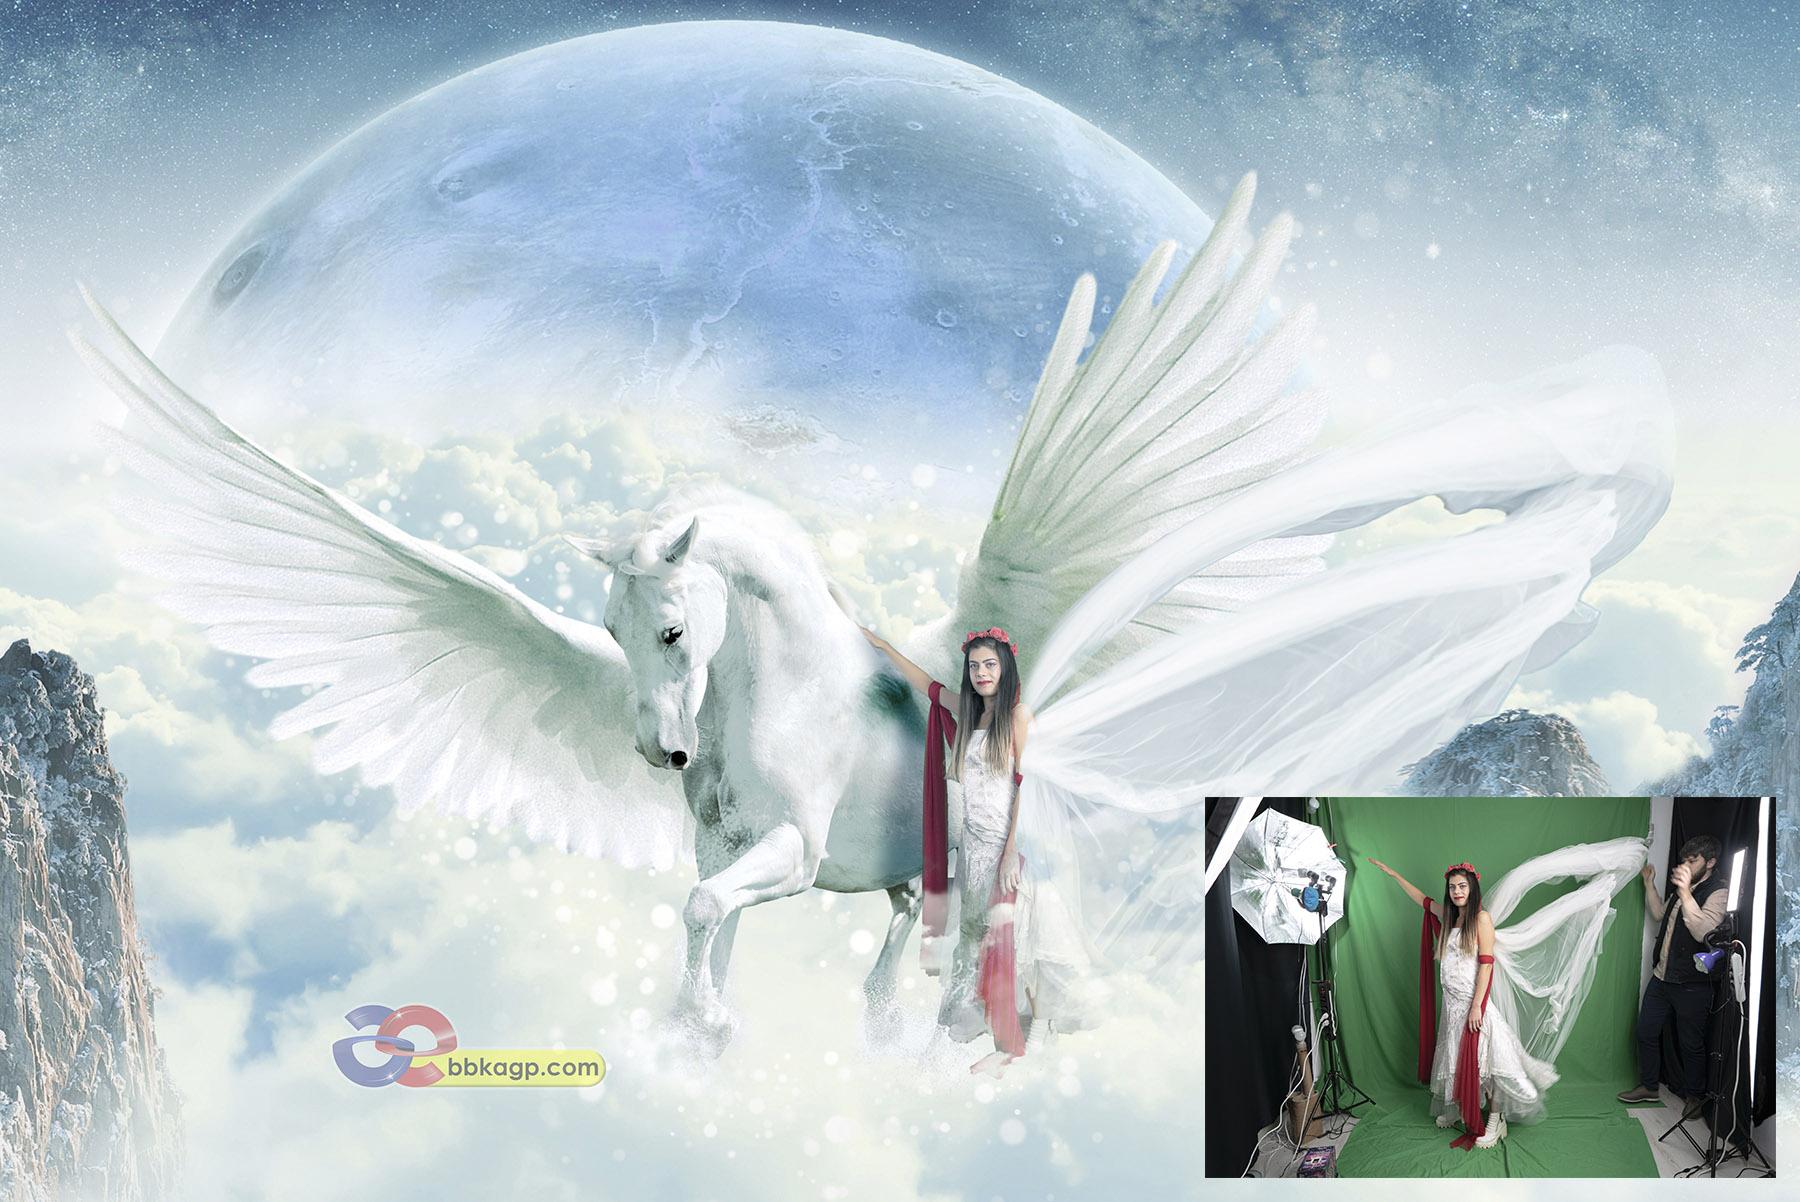 Fantastic Fotograf Cekimi Photoshop Editi Cankaya Kizilay